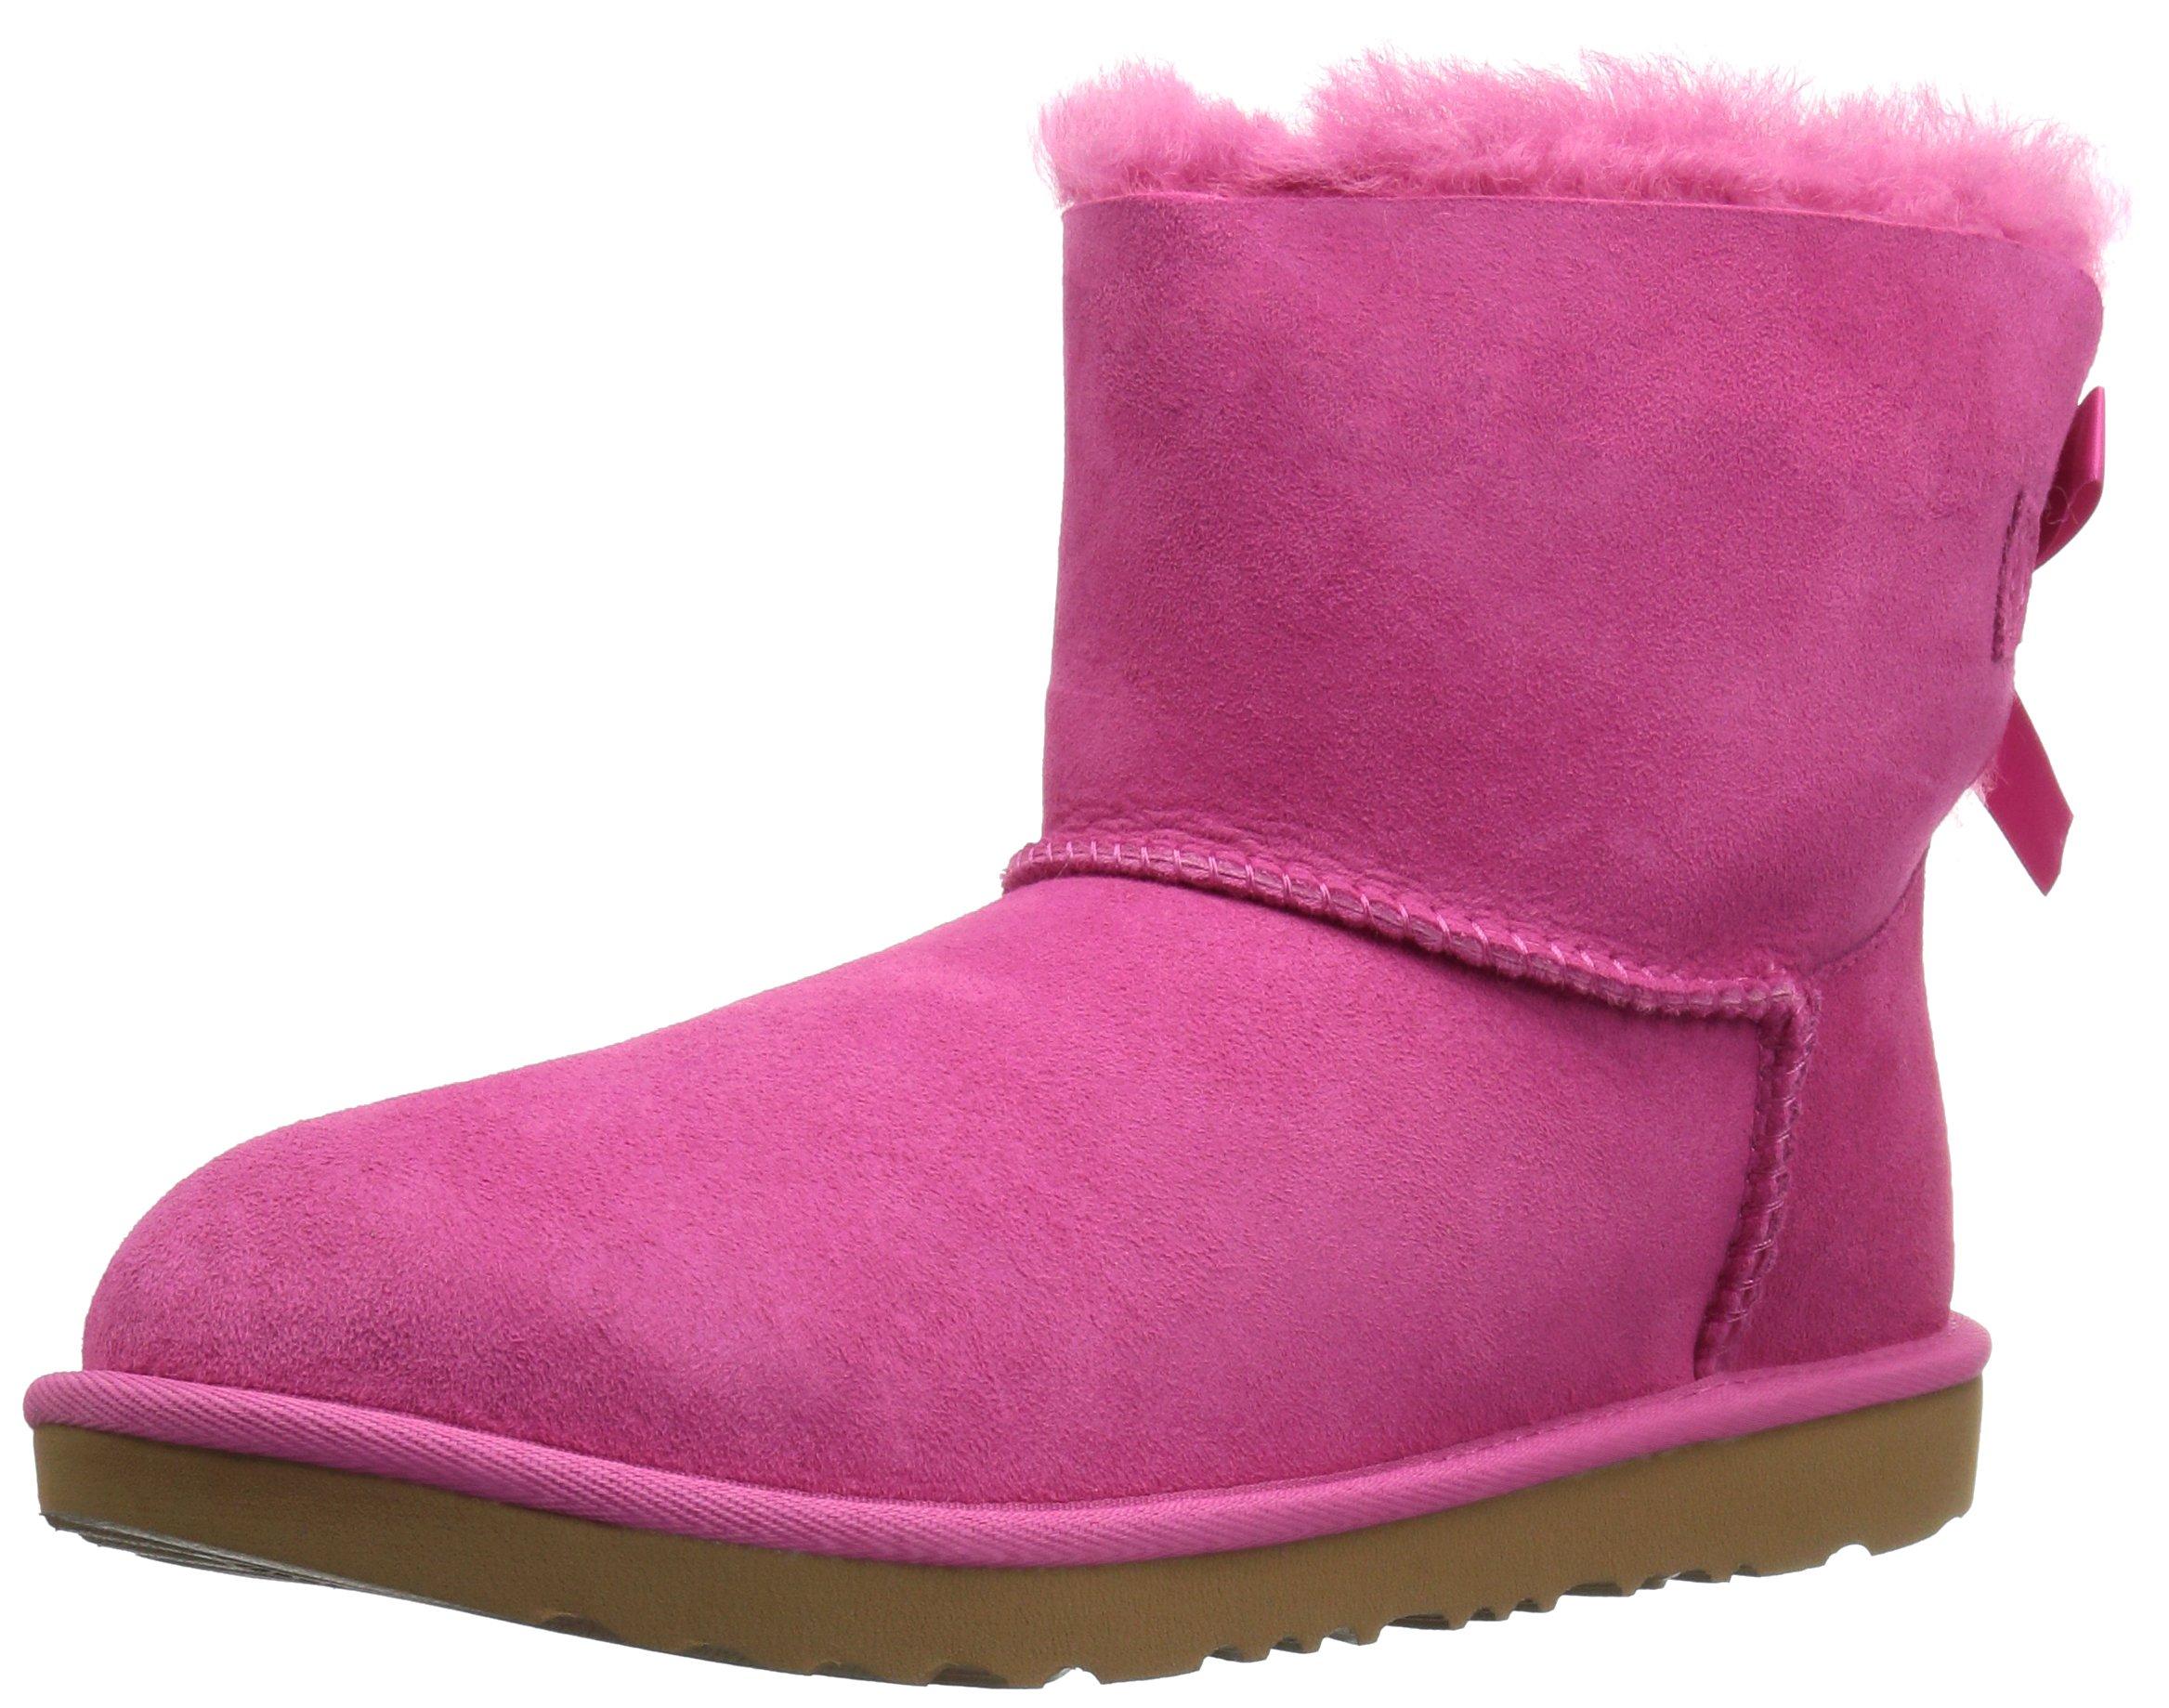 UGG Kids K Mini Bailey Bow II Pull-on Boot,Pink Azalea,6 M US Big Kid